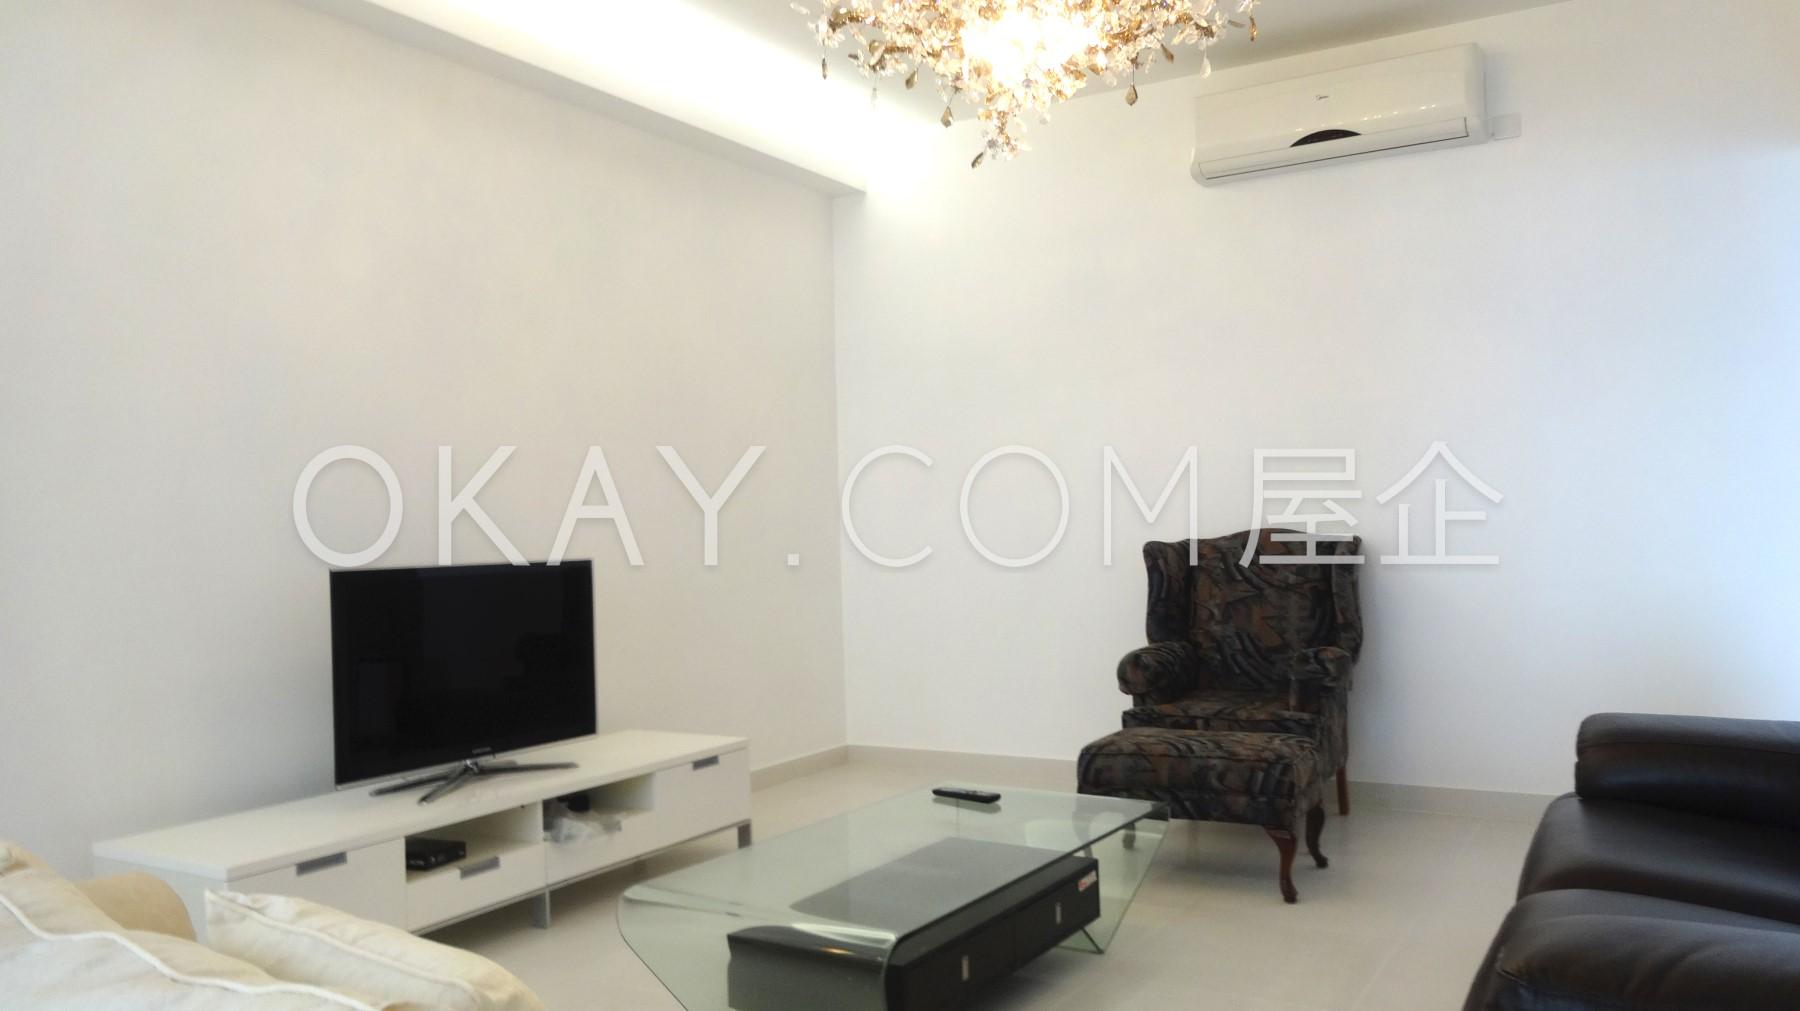 Reverse view - living room